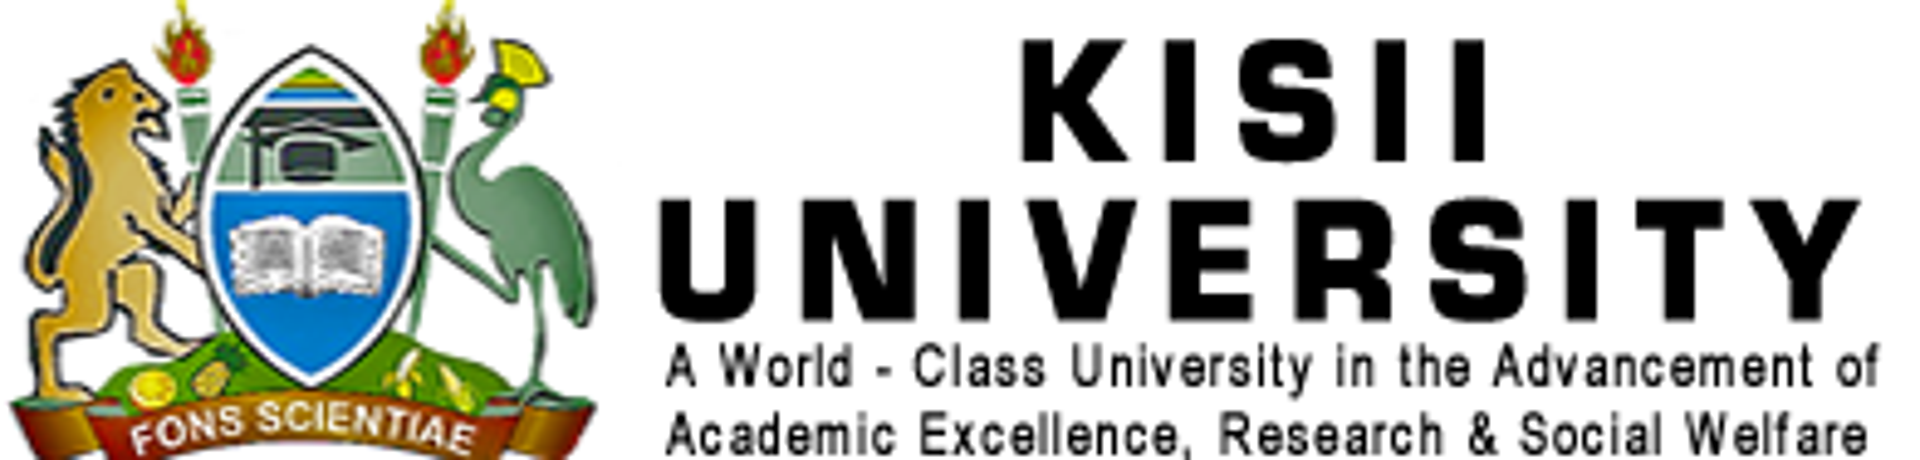 Logo 1530105211.png?ixlib=rb 1.1